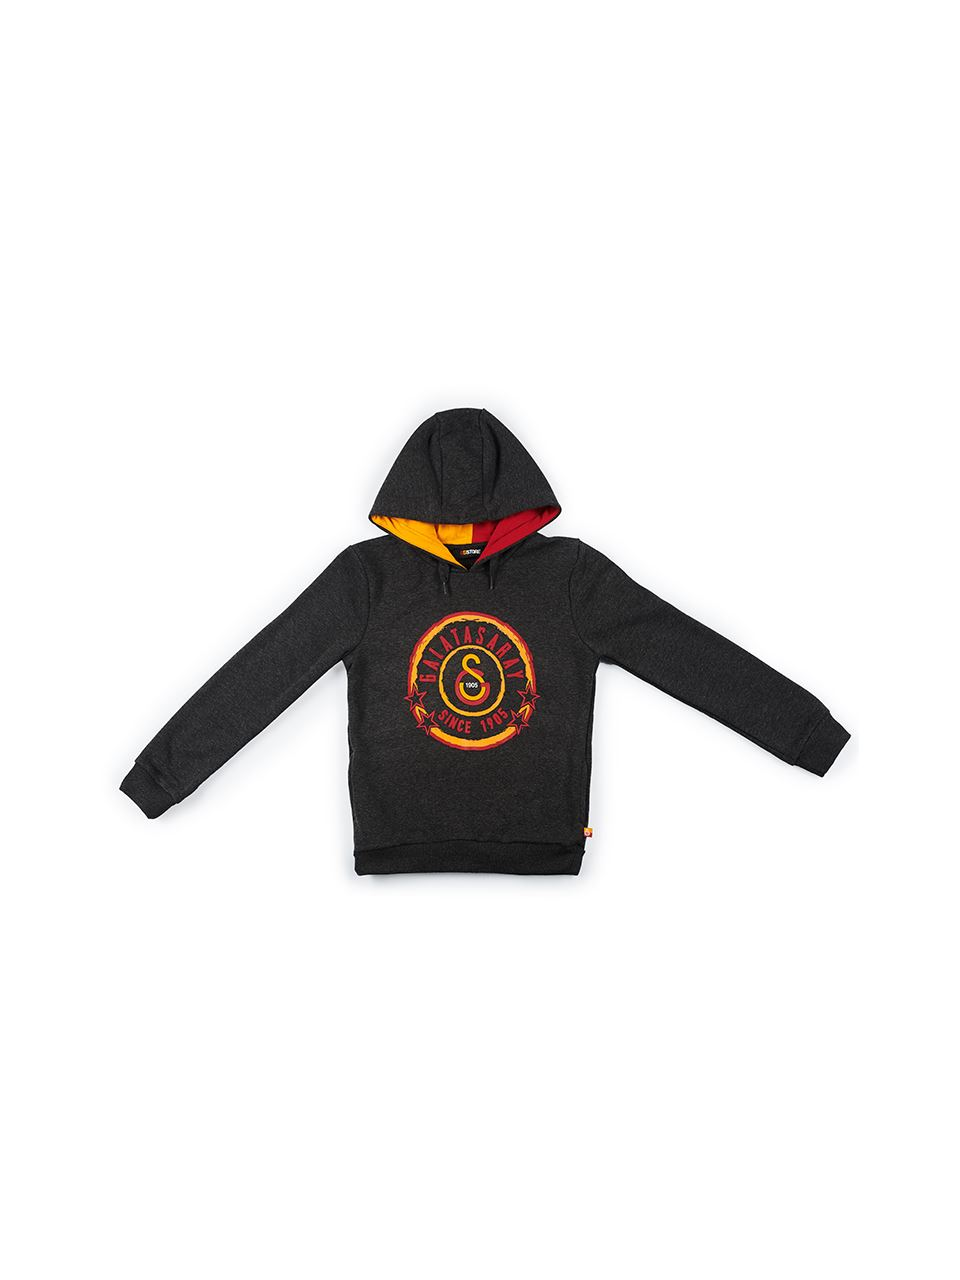 C192050 Sweatshirt